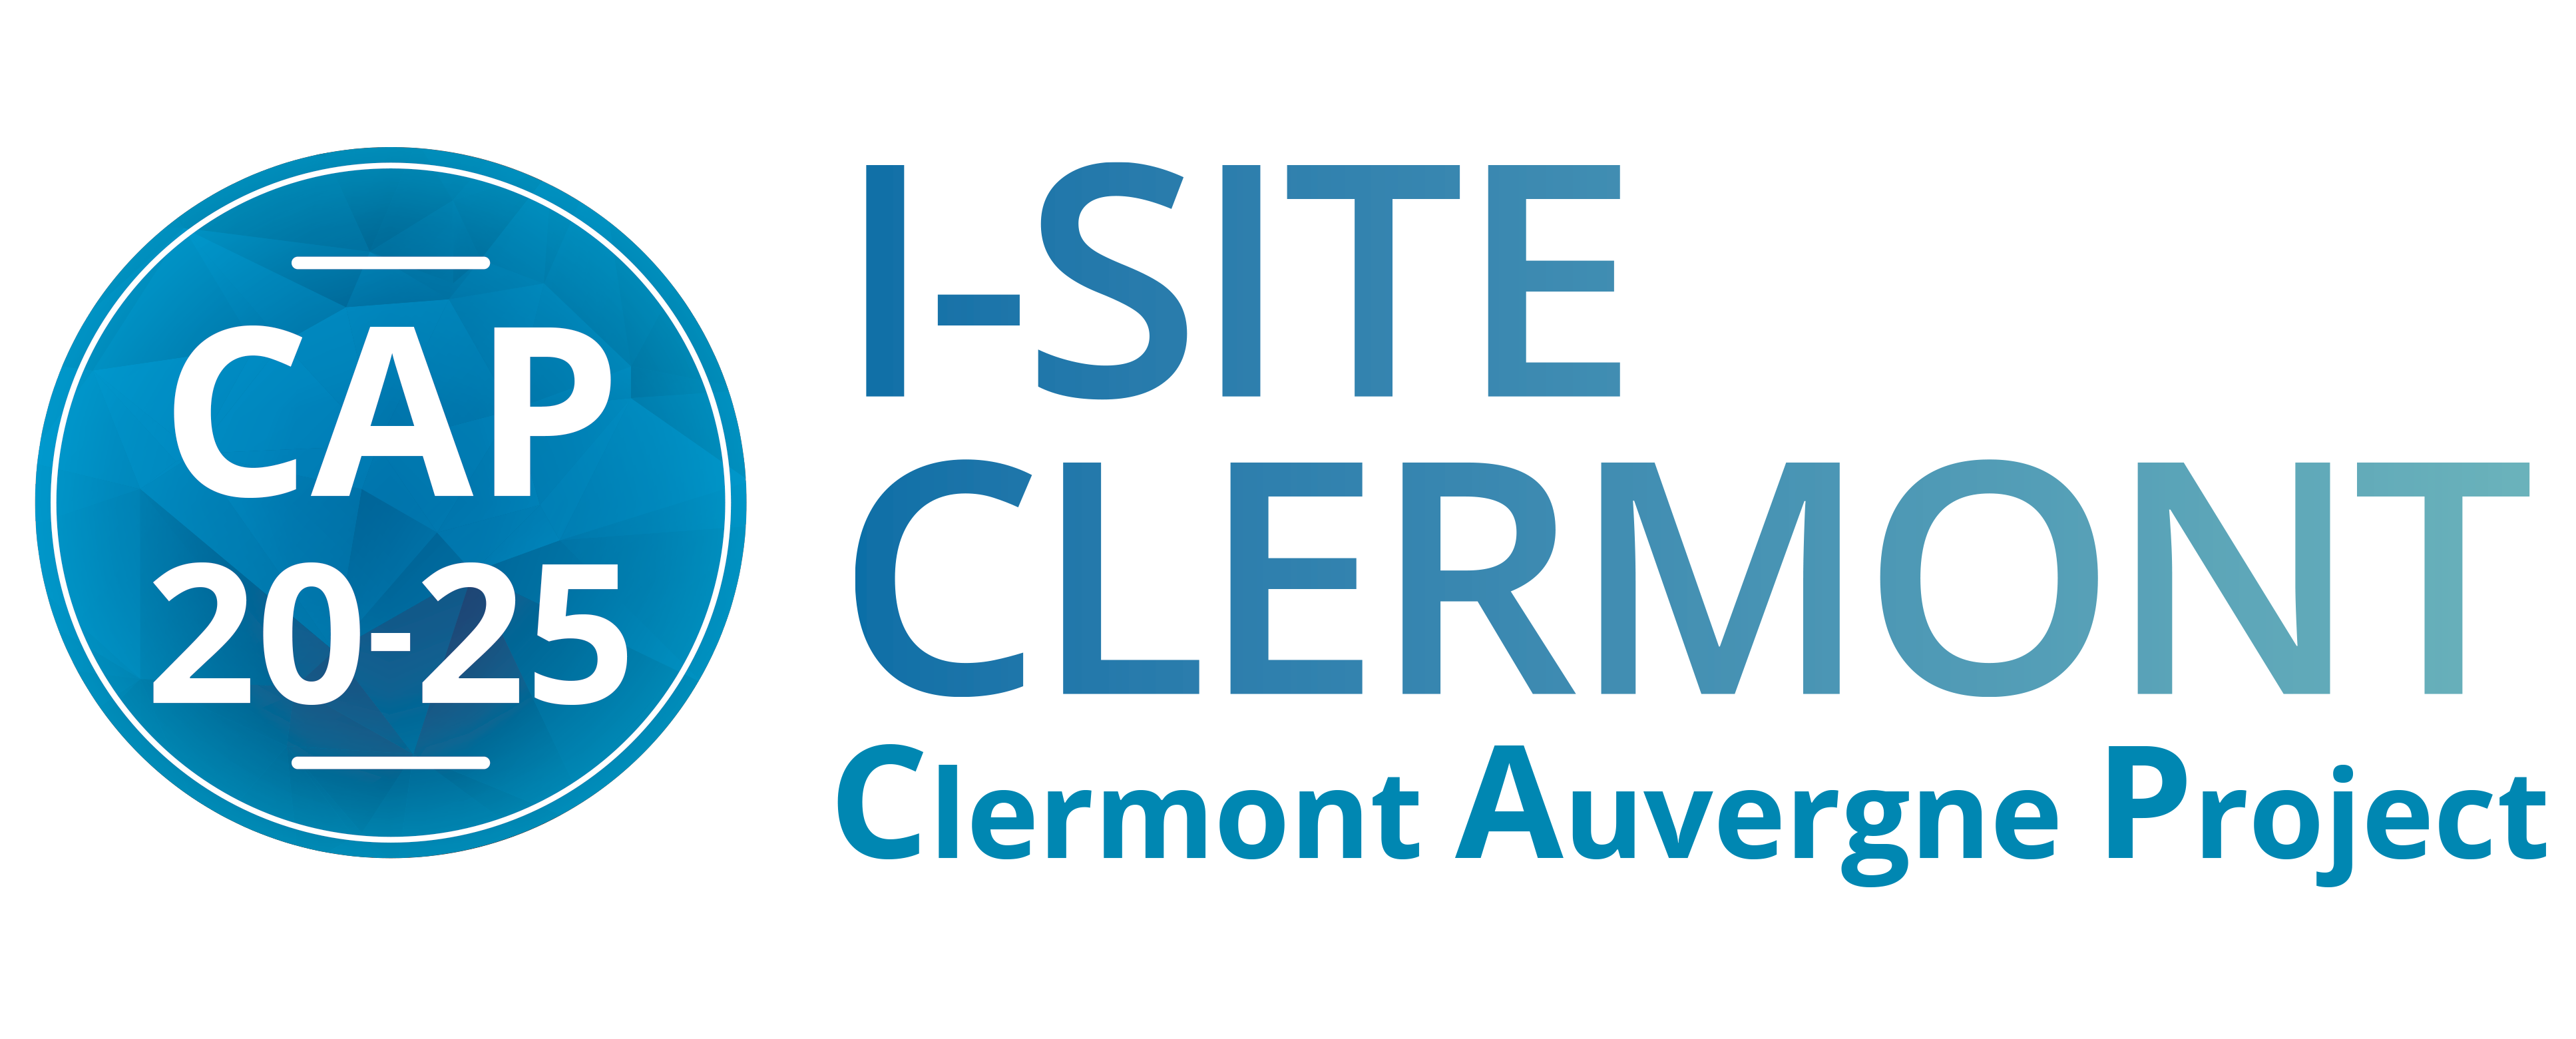 Logo_CAP 20-25_I-SITE-Clermont_texte bleu.png